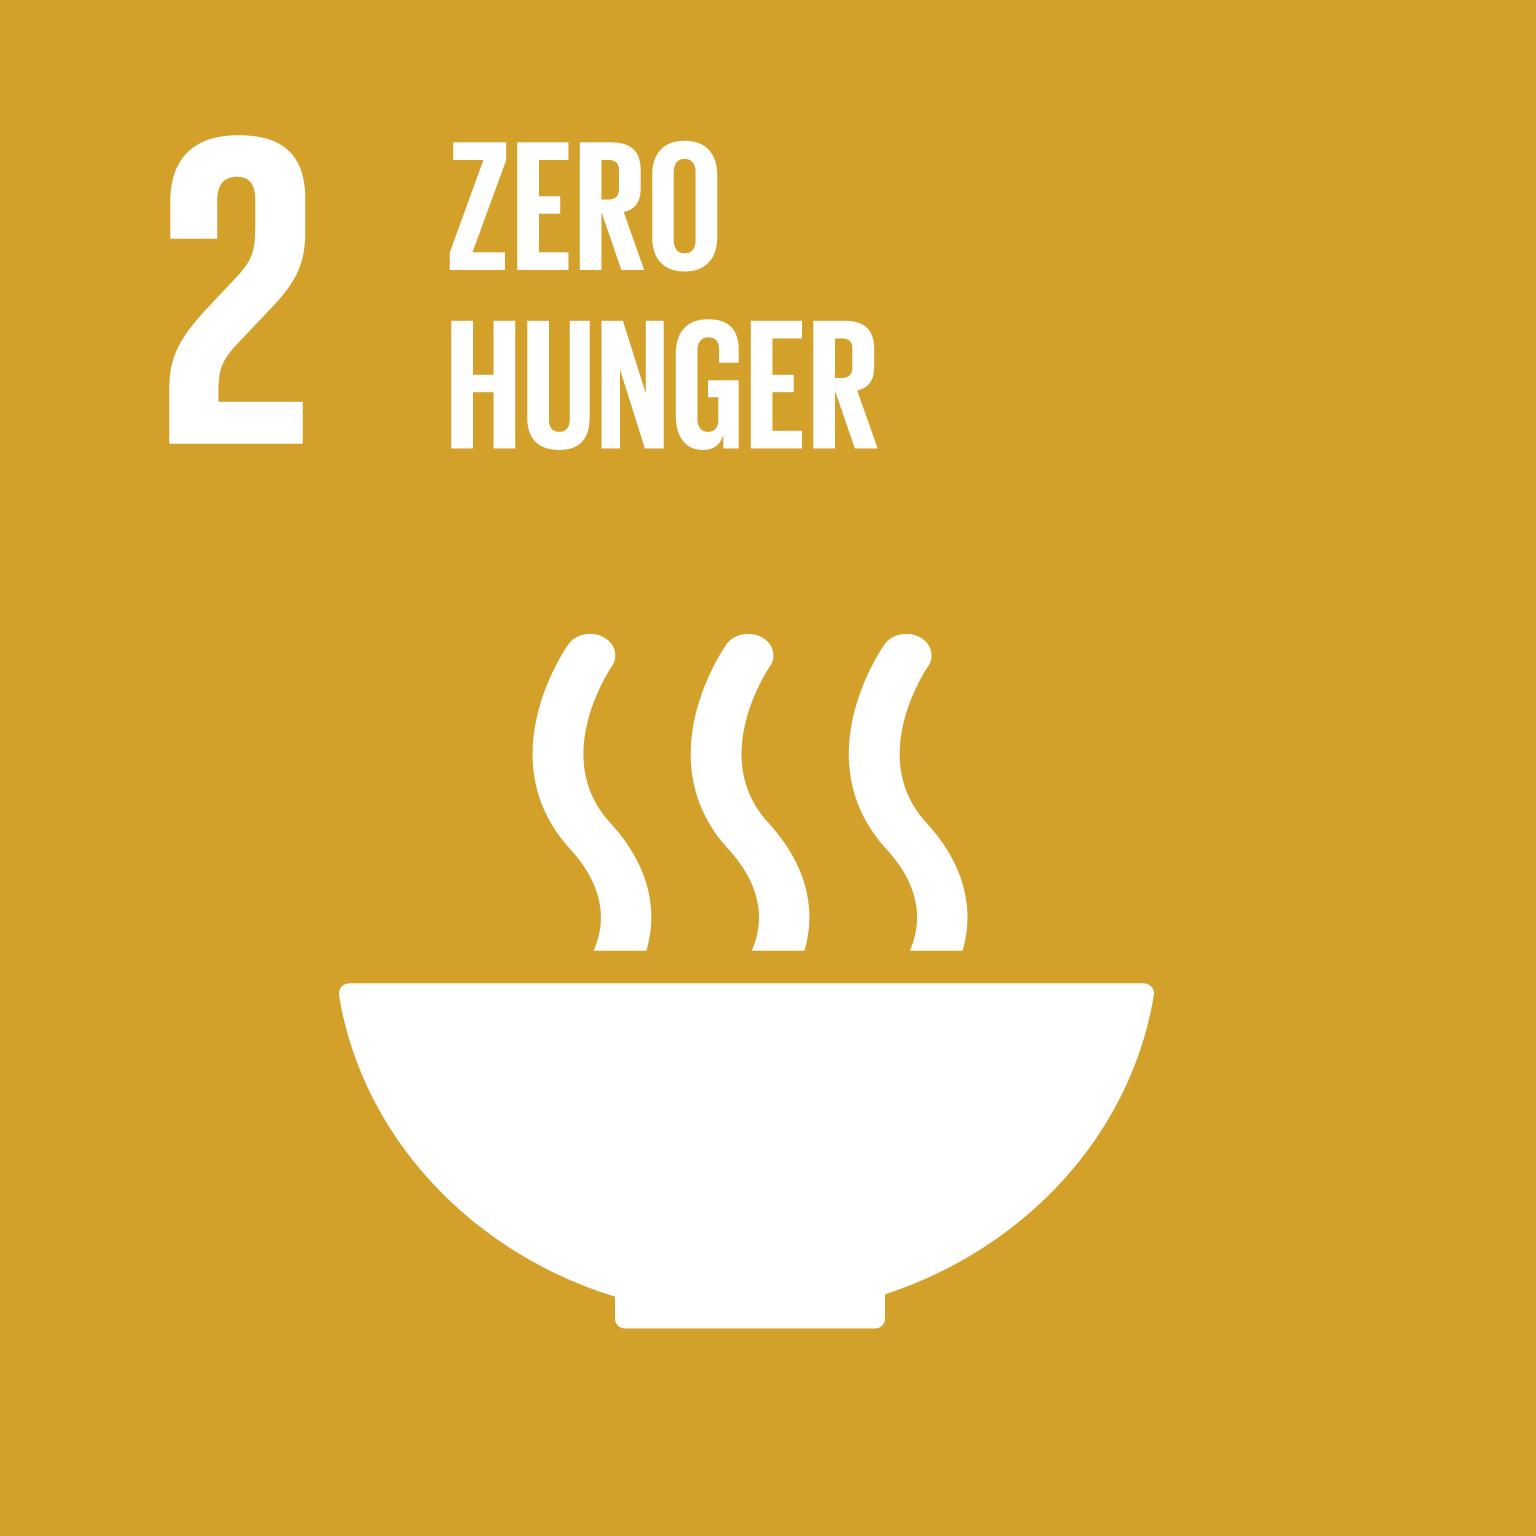 E SDG goals icons individual rgb 02